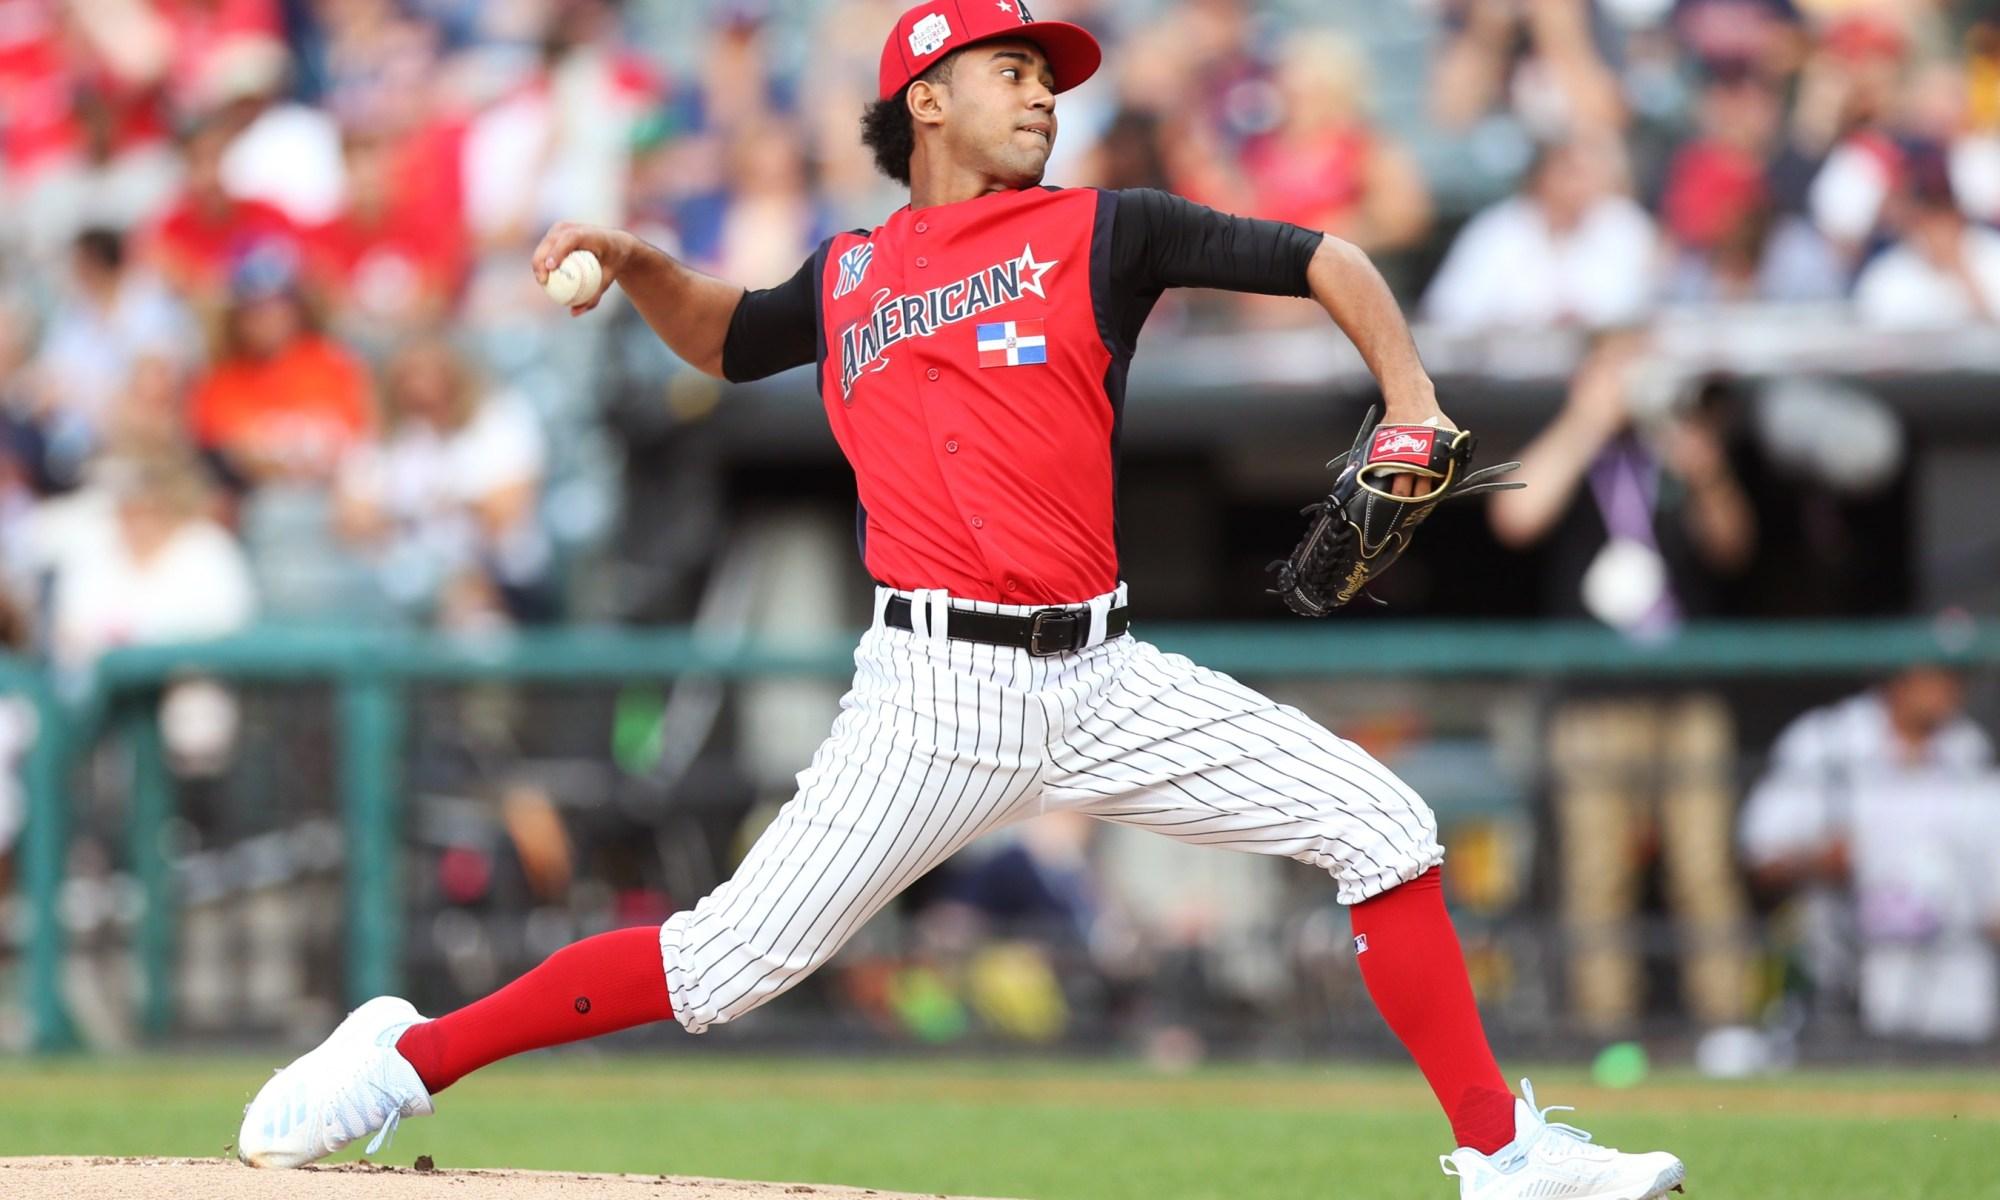 Can Deivi Garcia make an impact for the Yankees in 2020?